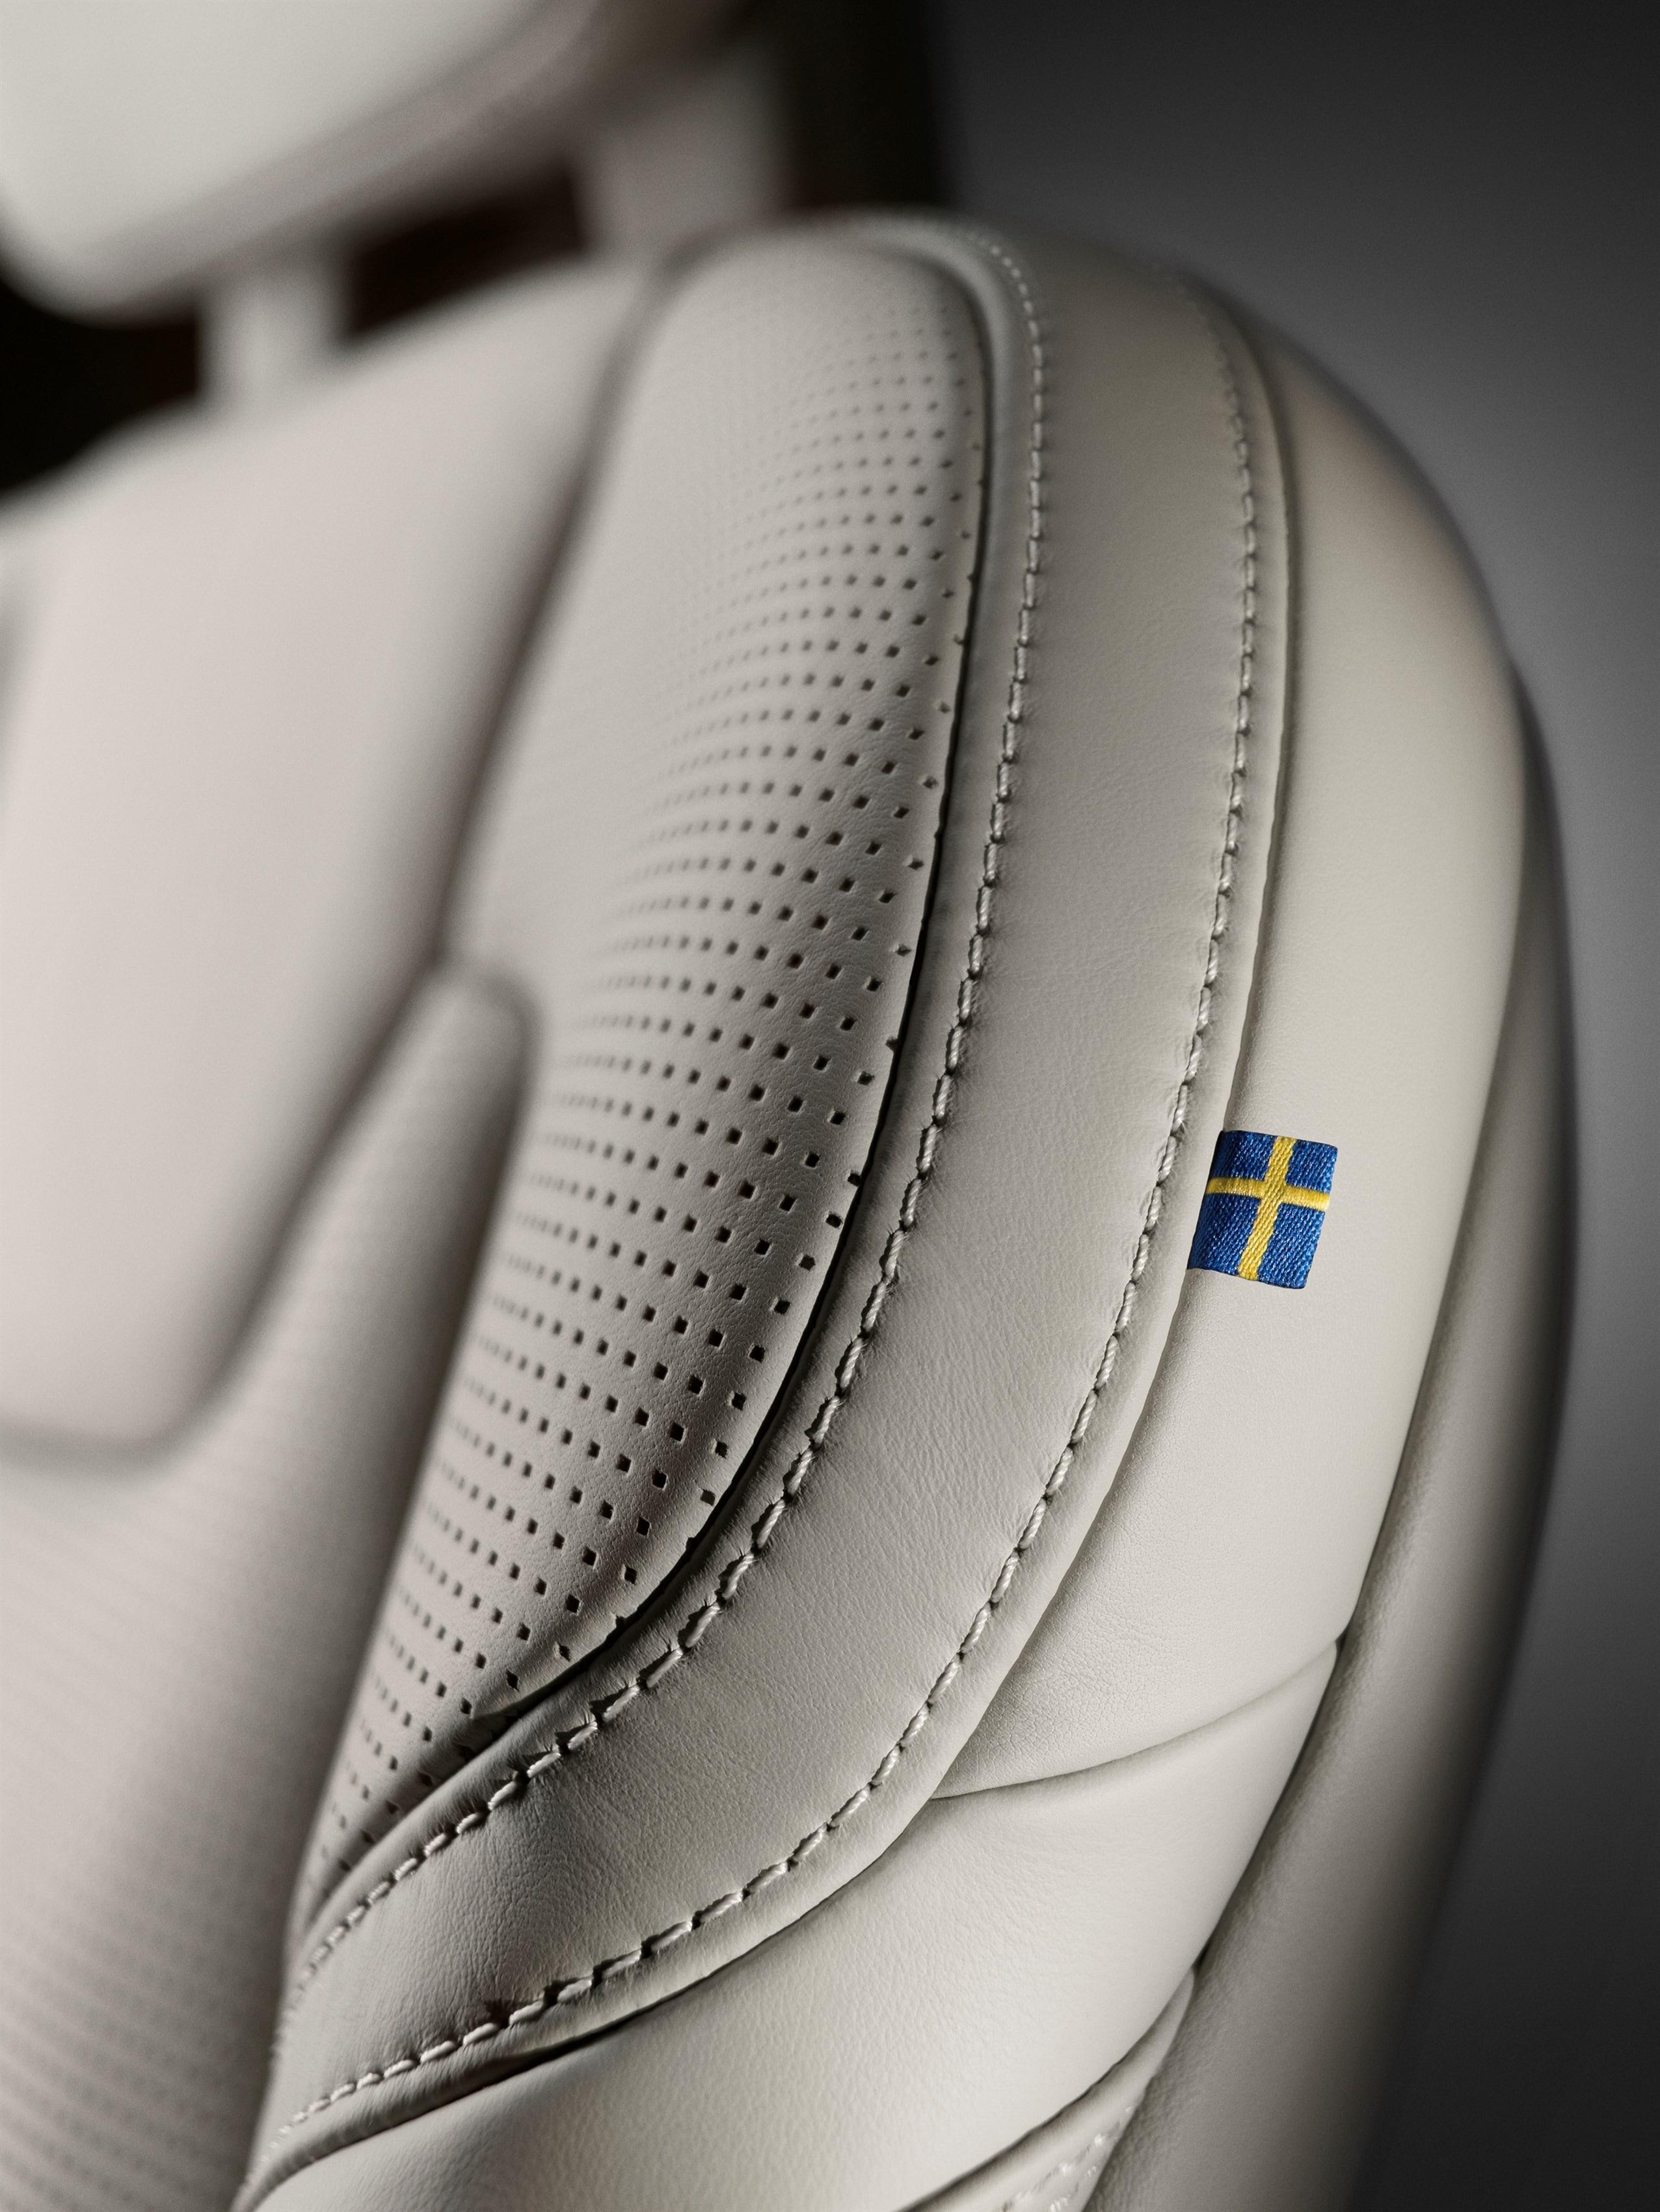 New 2018 2019 Volvo Used Car Dealer